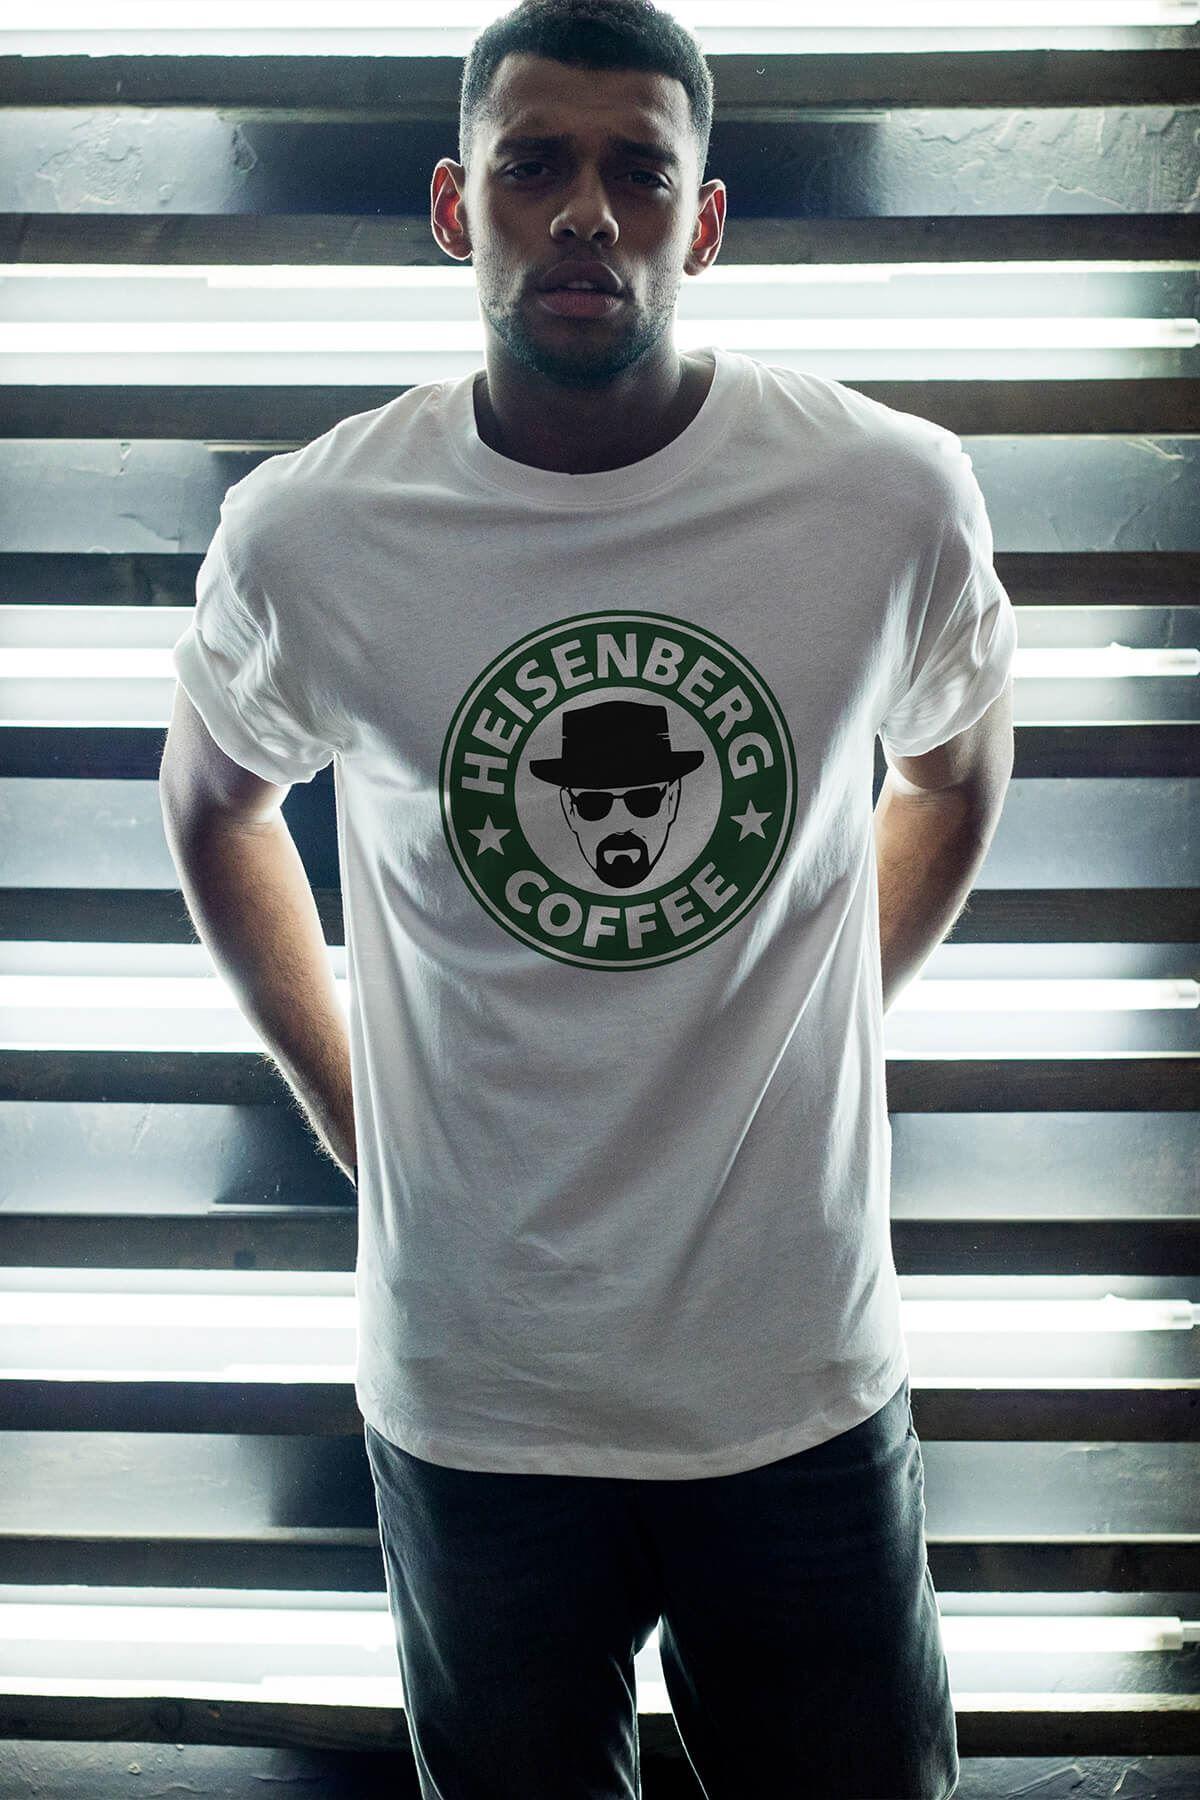 Breaking Bad Heisenberg 14 Beyaz Erkek Oversize Tshirt - Tişört